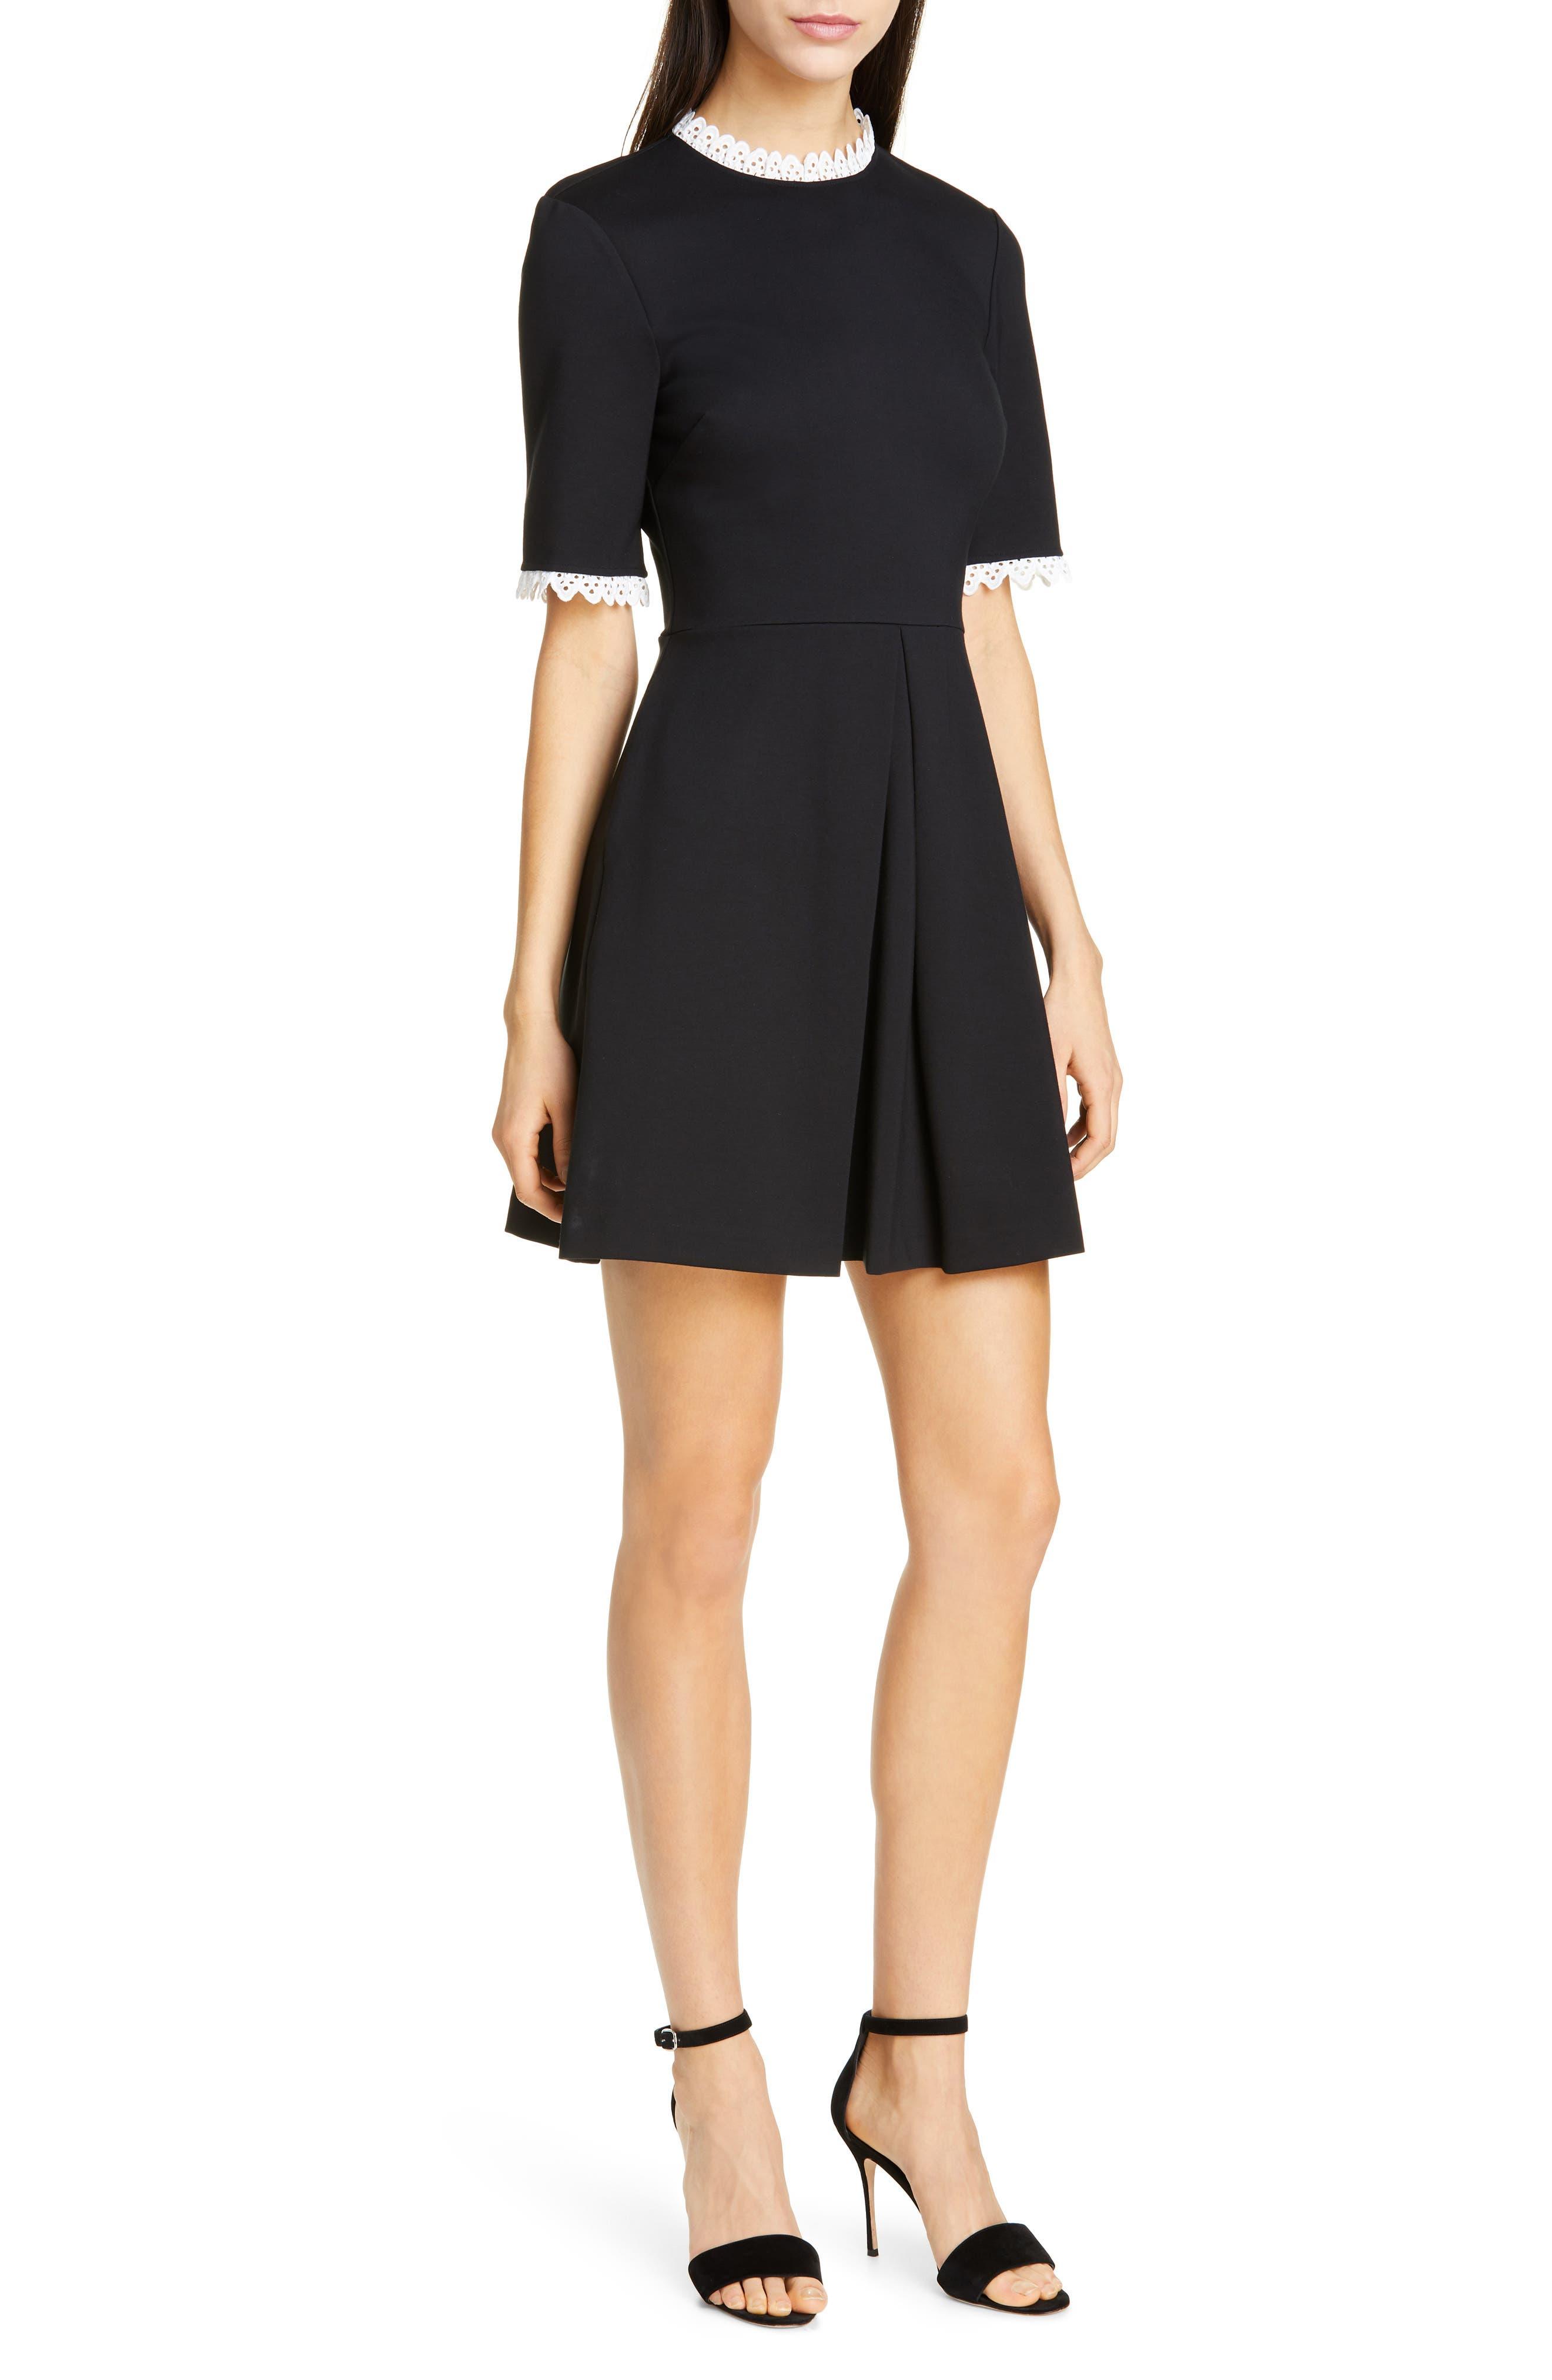 Ted Baker London Blussum Broderie Trim A-Line Dress, Black